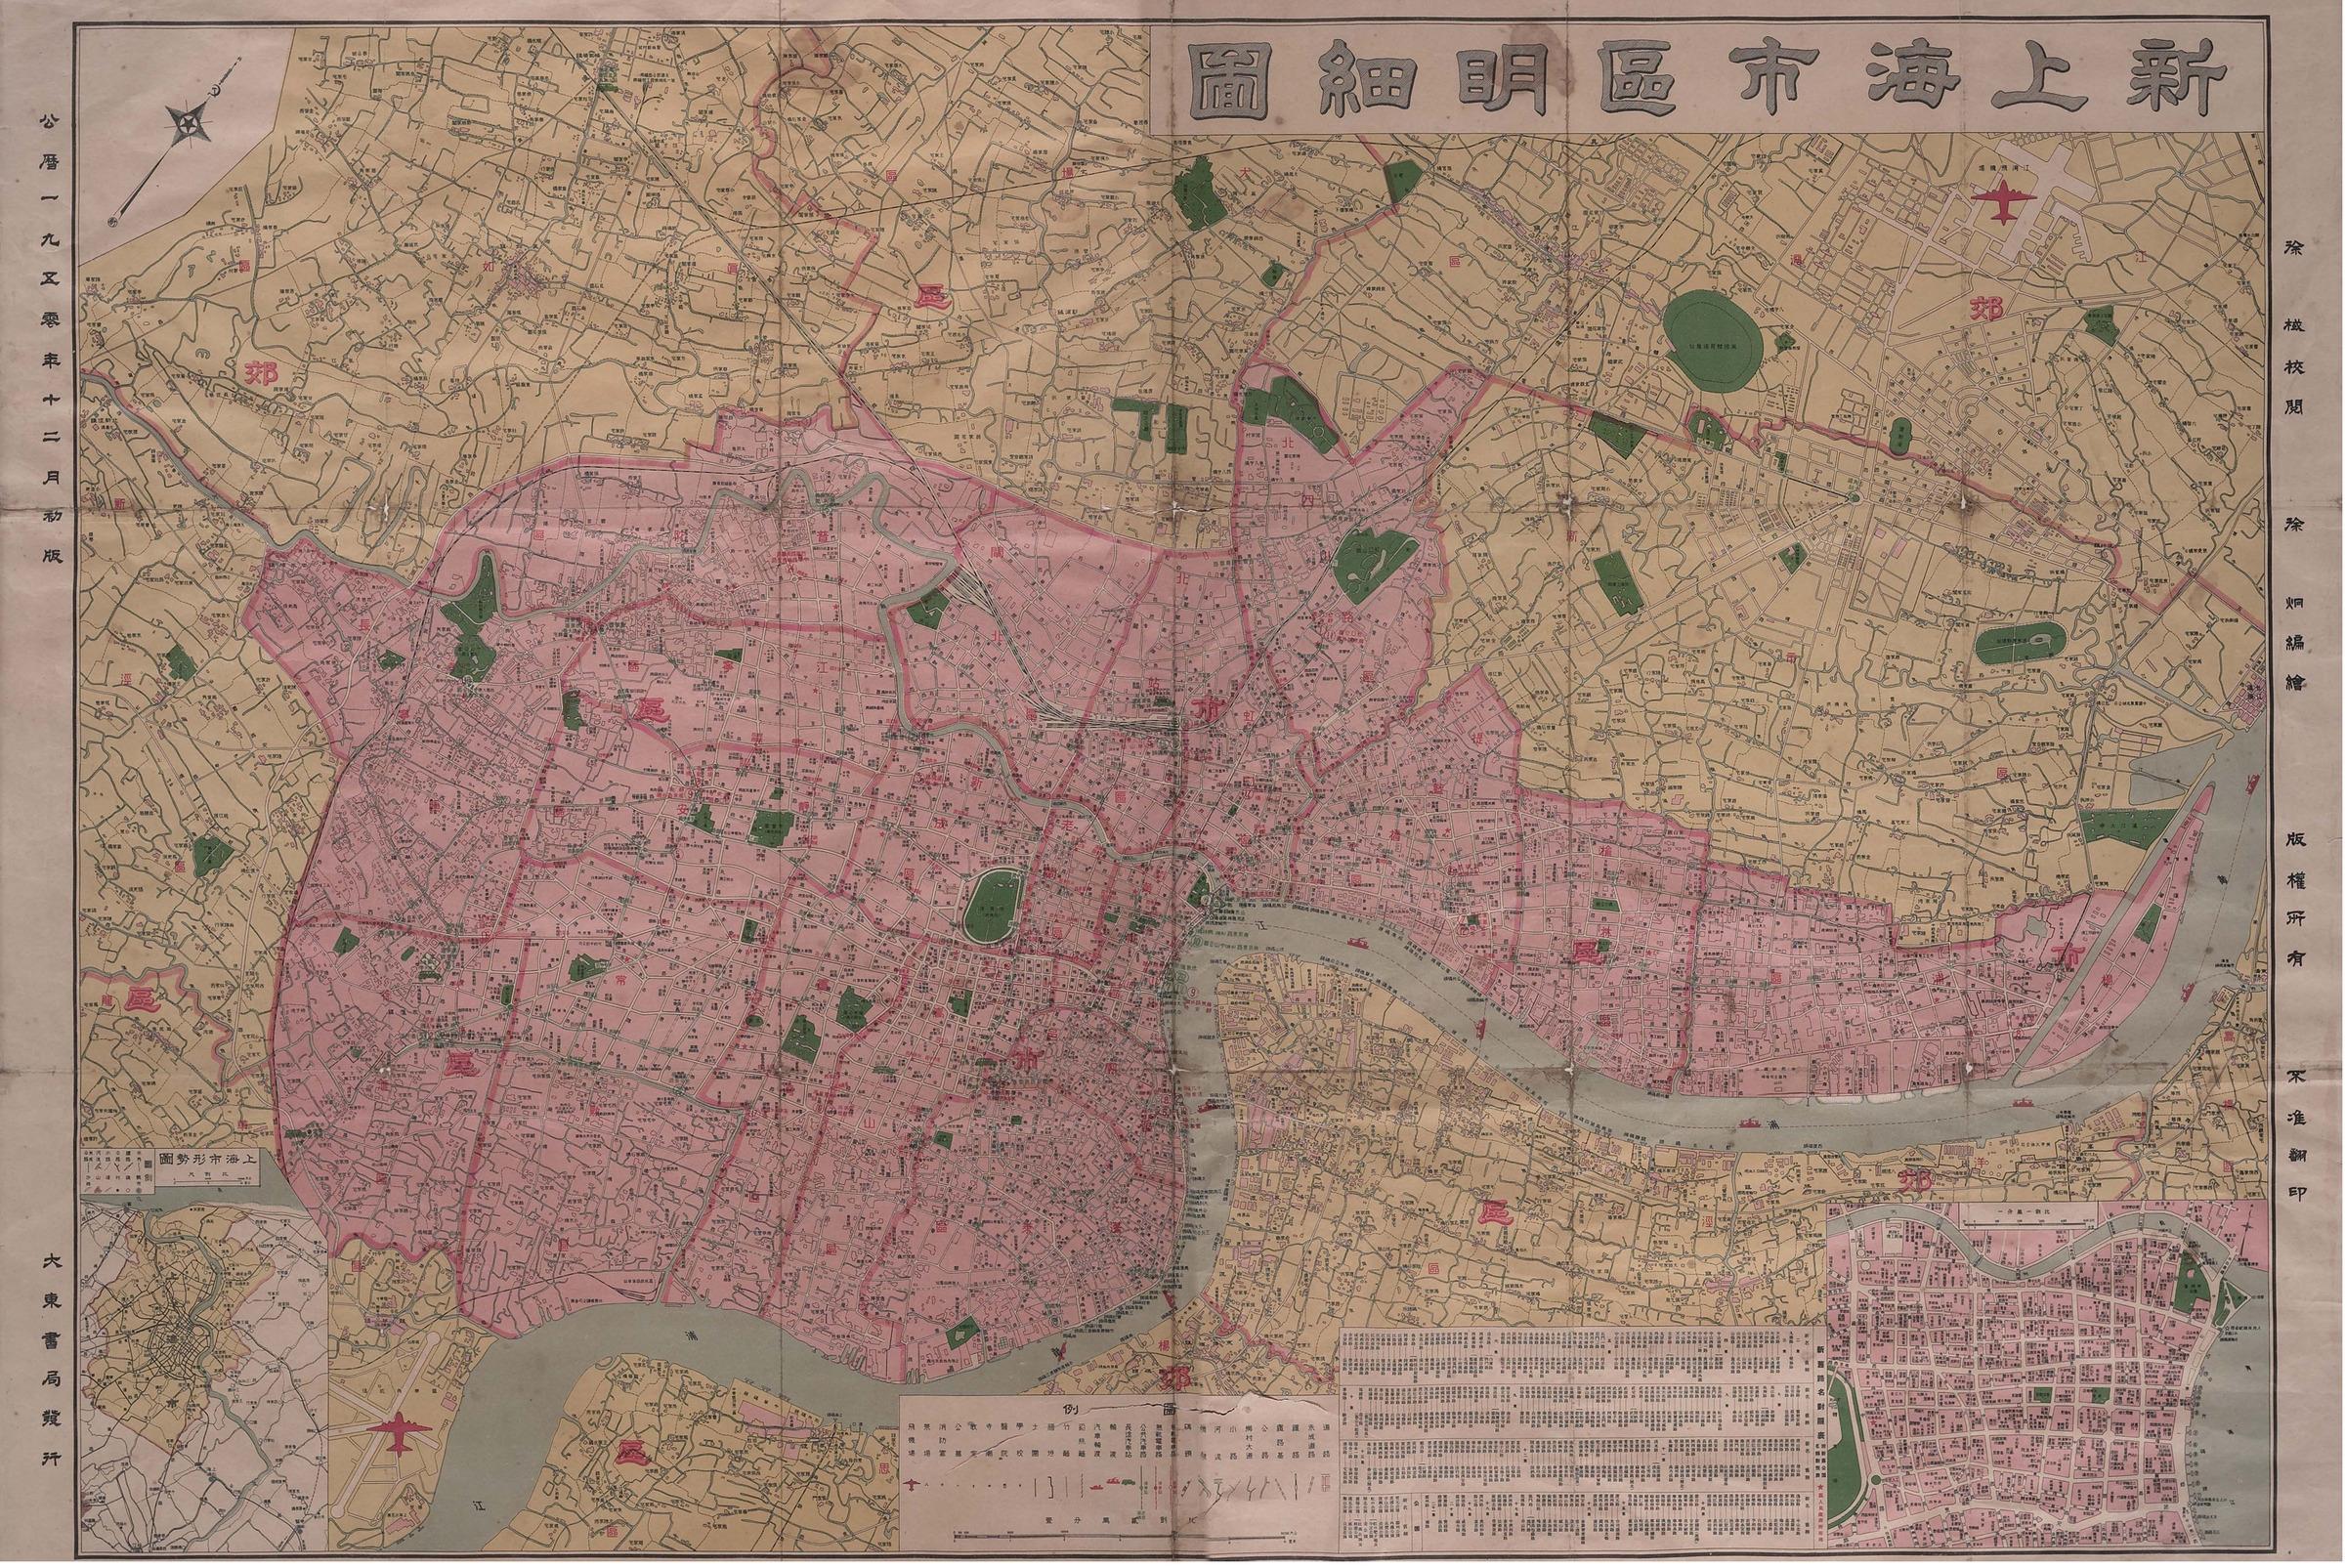 Shanghai Street Map One Street Map of Shanghai